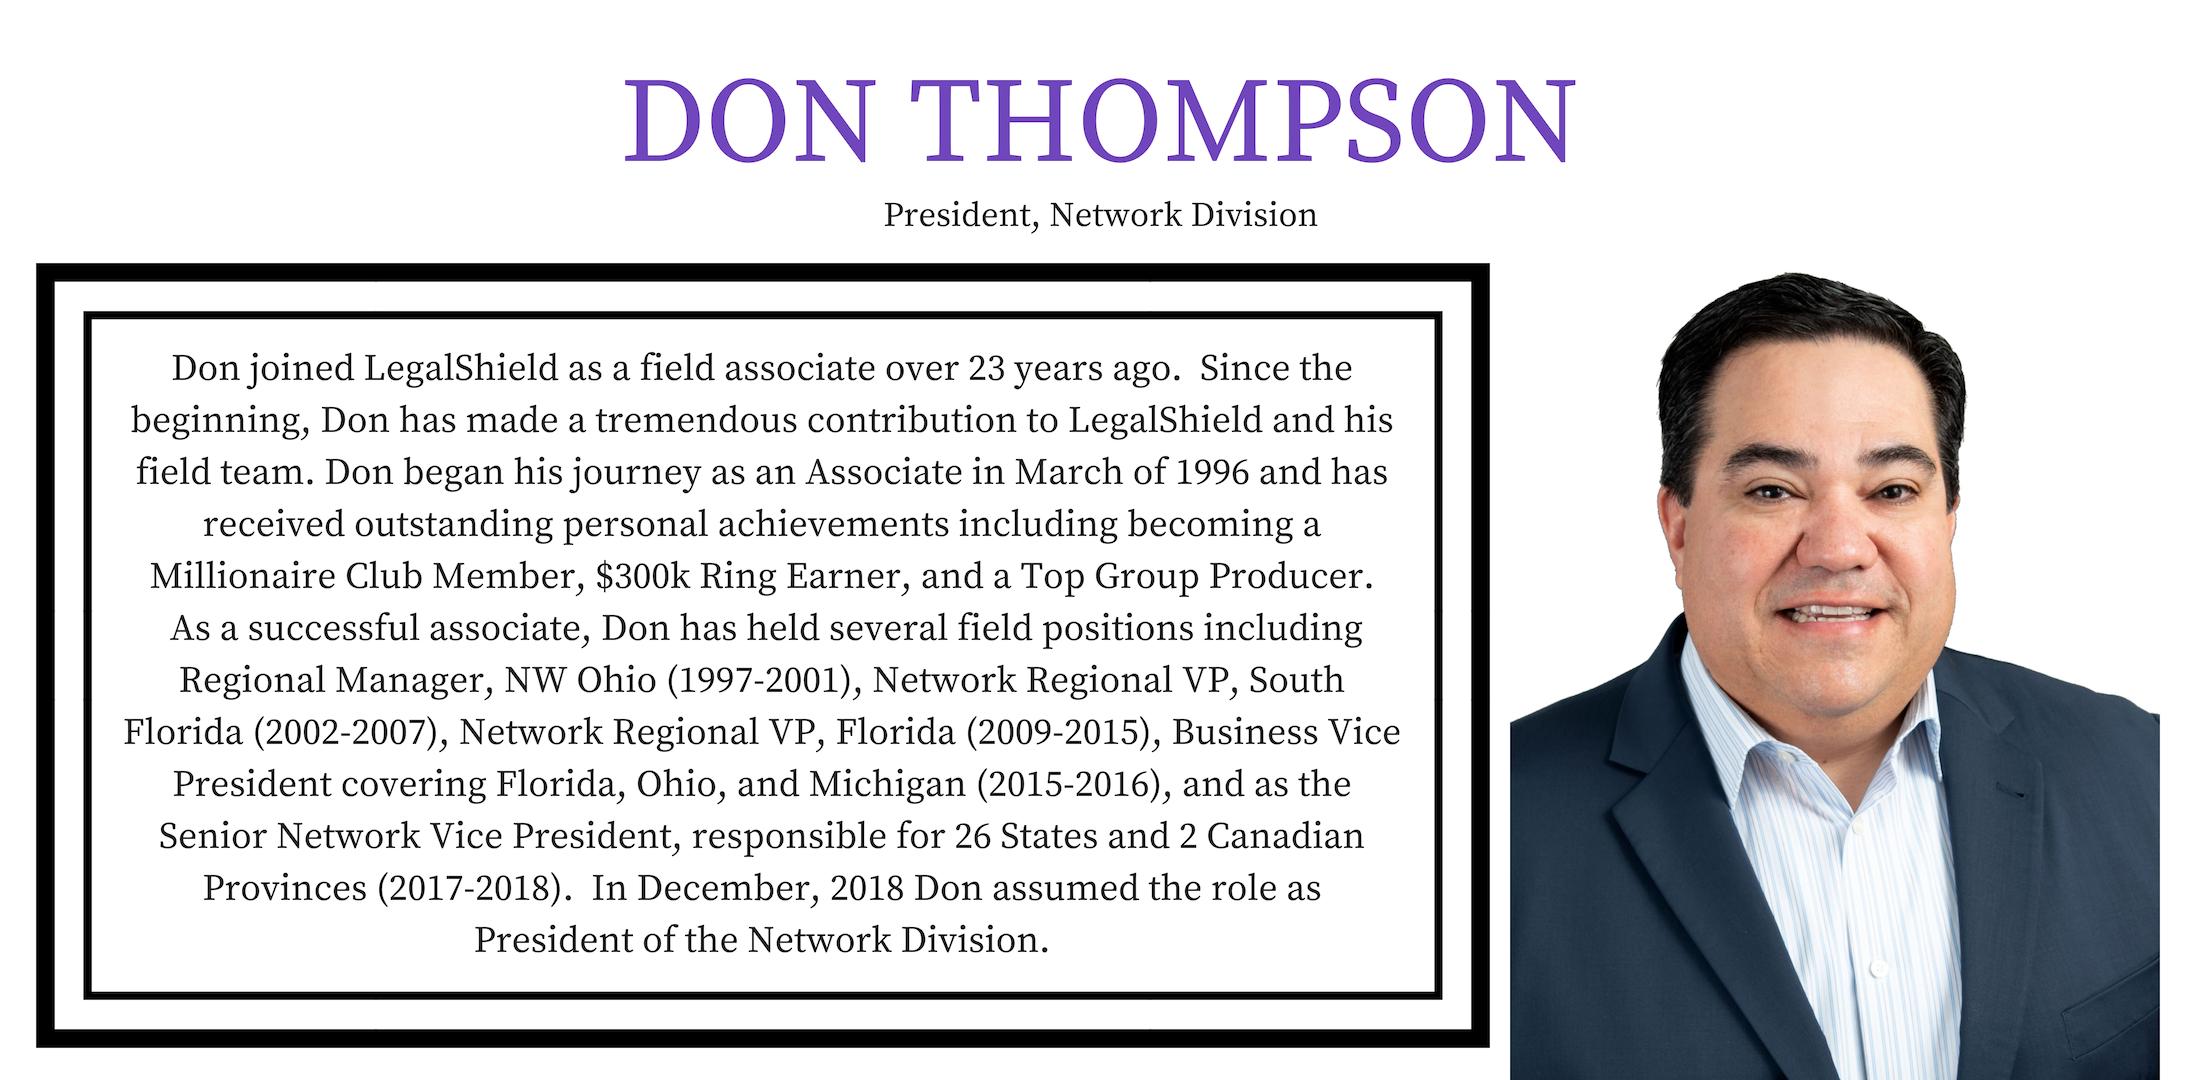 DonThompson